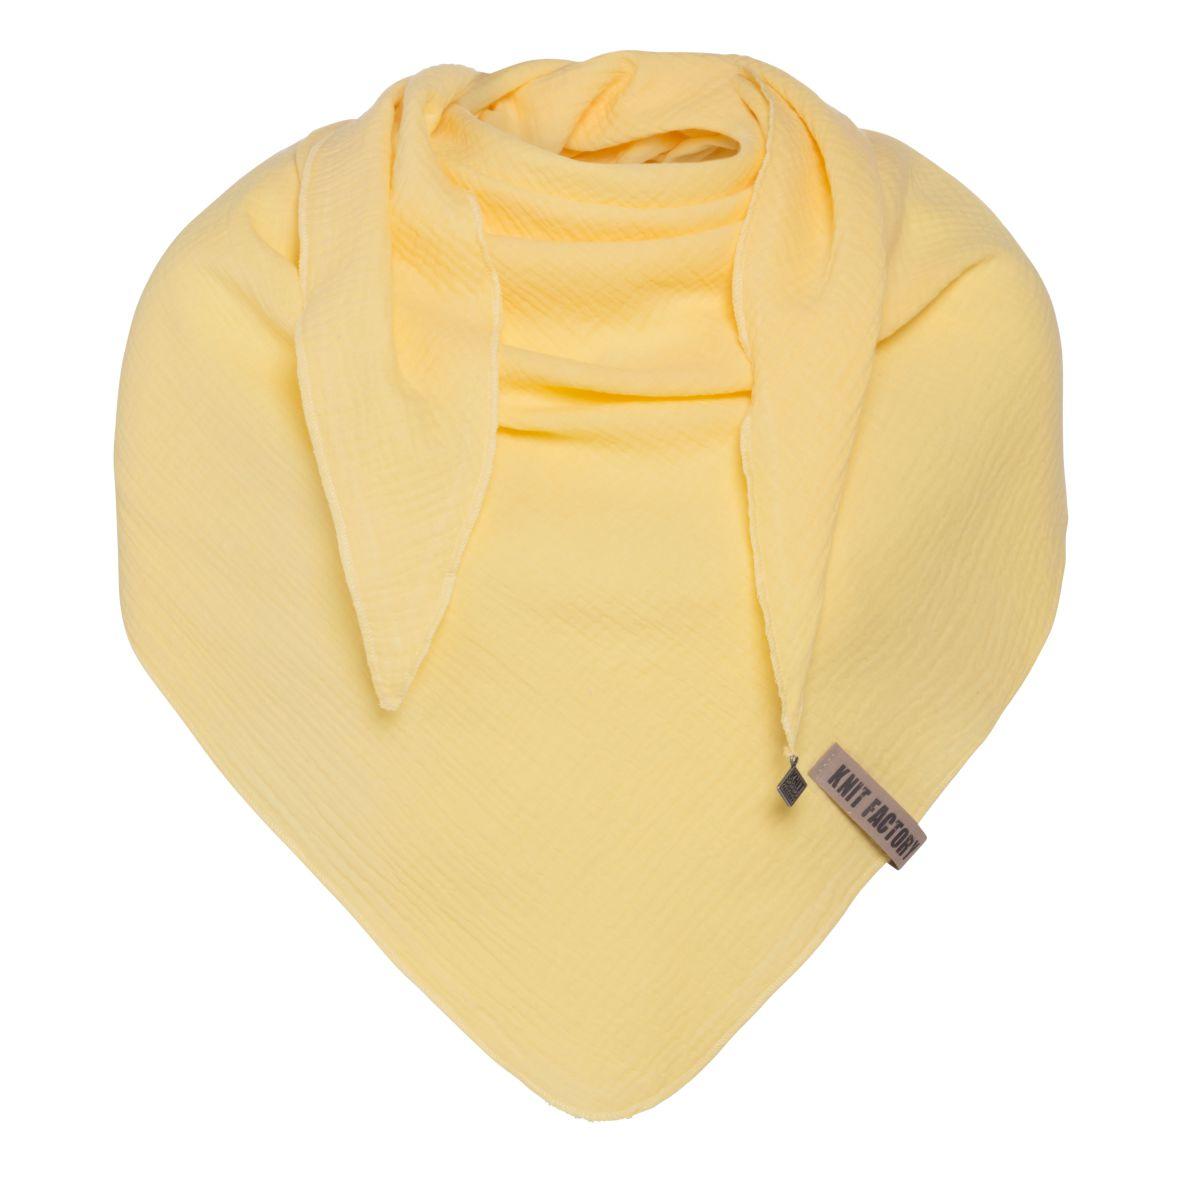 knit factory kf128060024 liv omslagdoek citrus 1